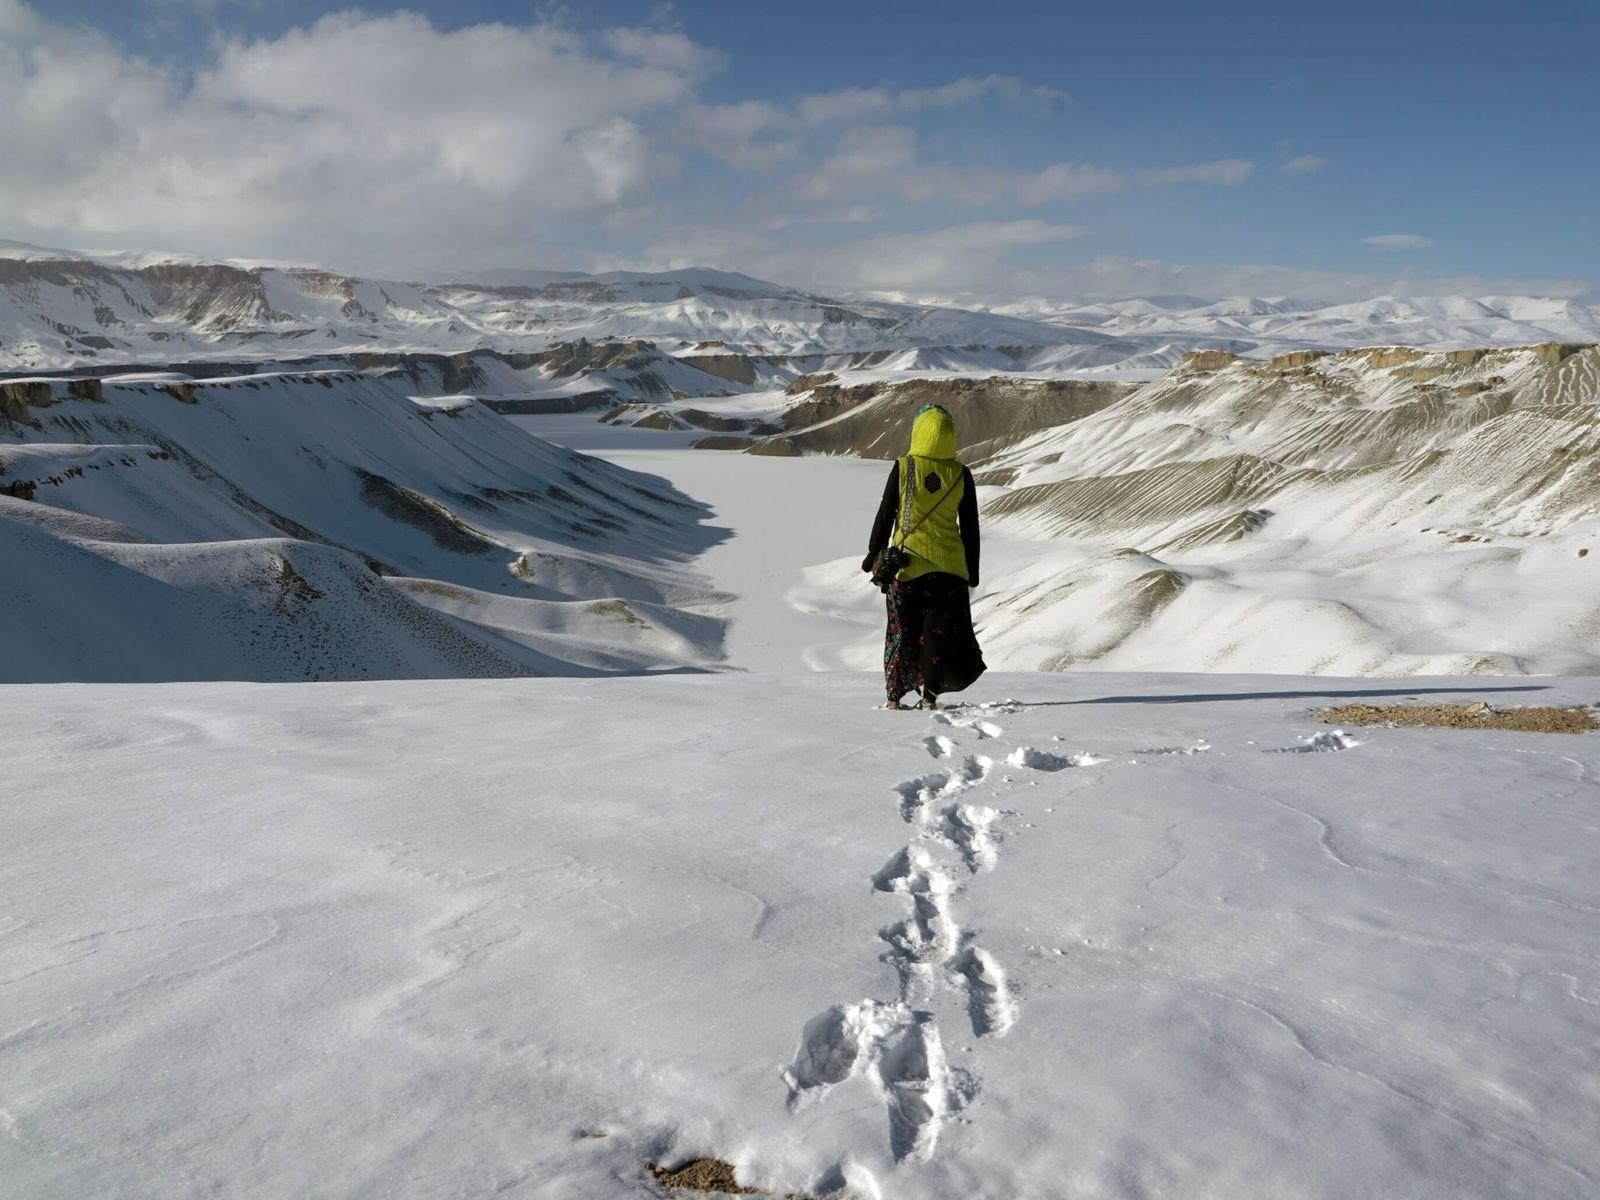 Band-e-Amir National Park